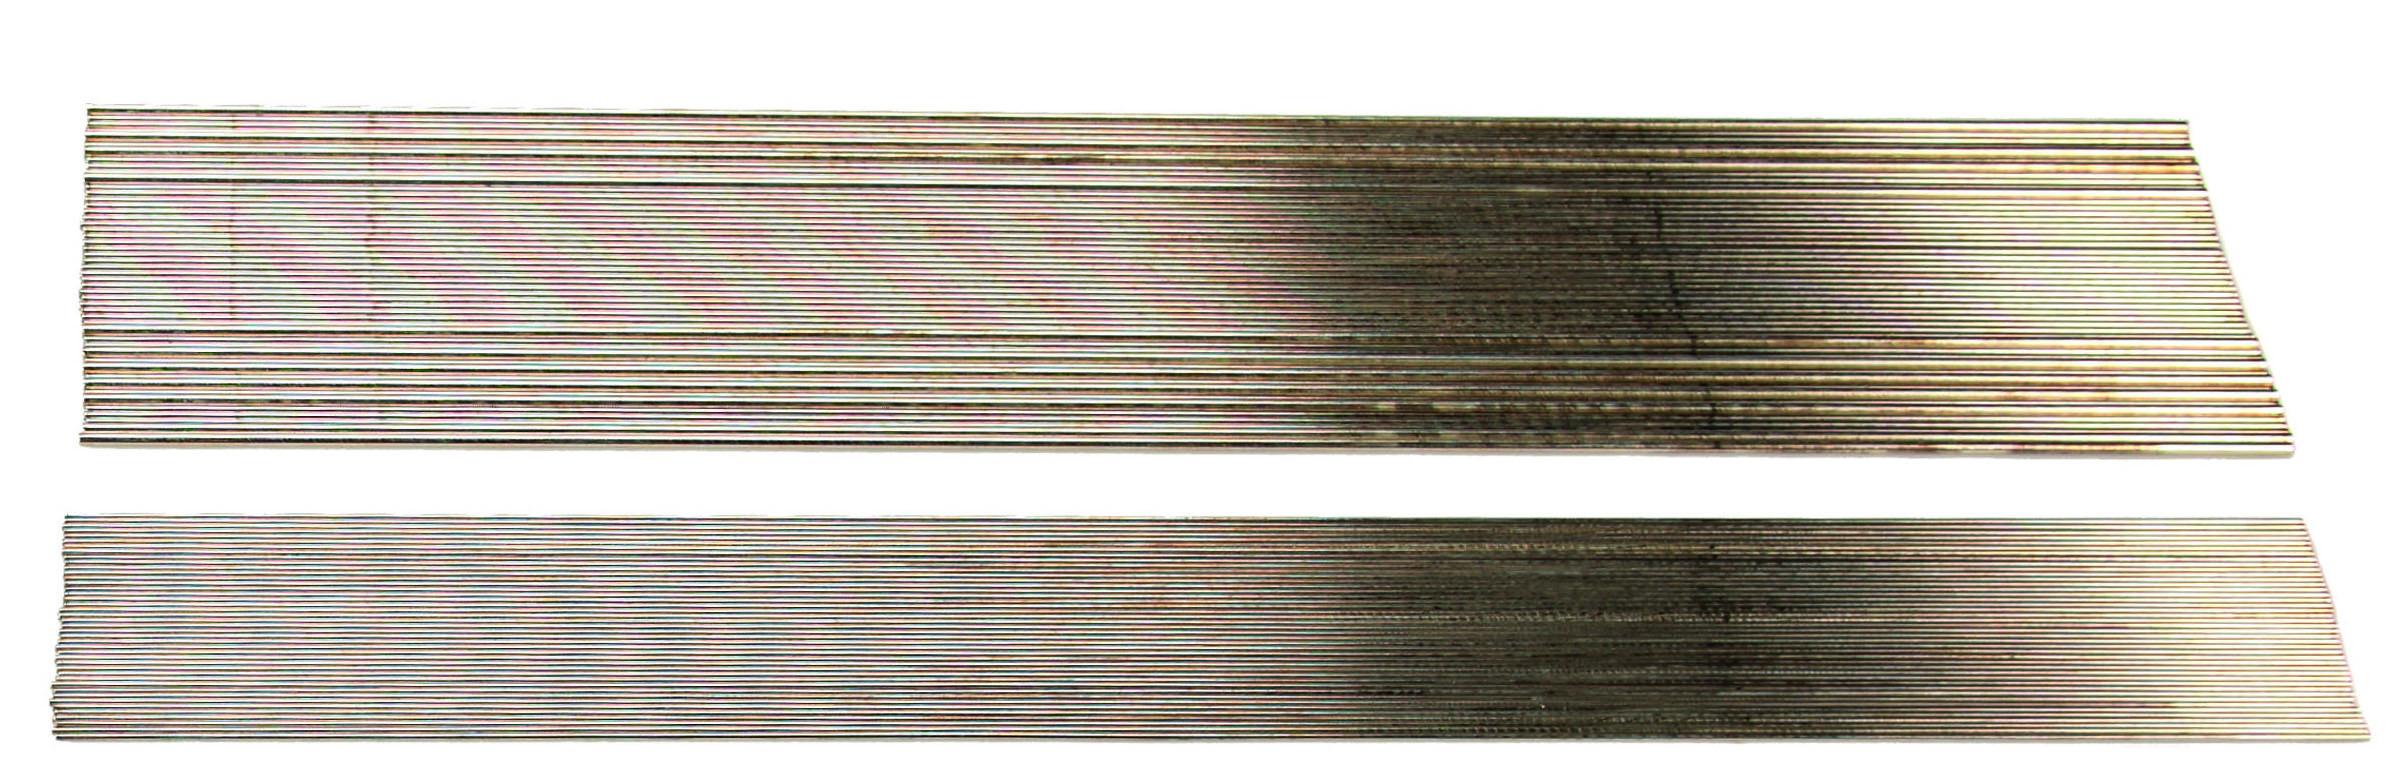 Silberhartlot massiv dia. 2,0 L-AG 55 Sn